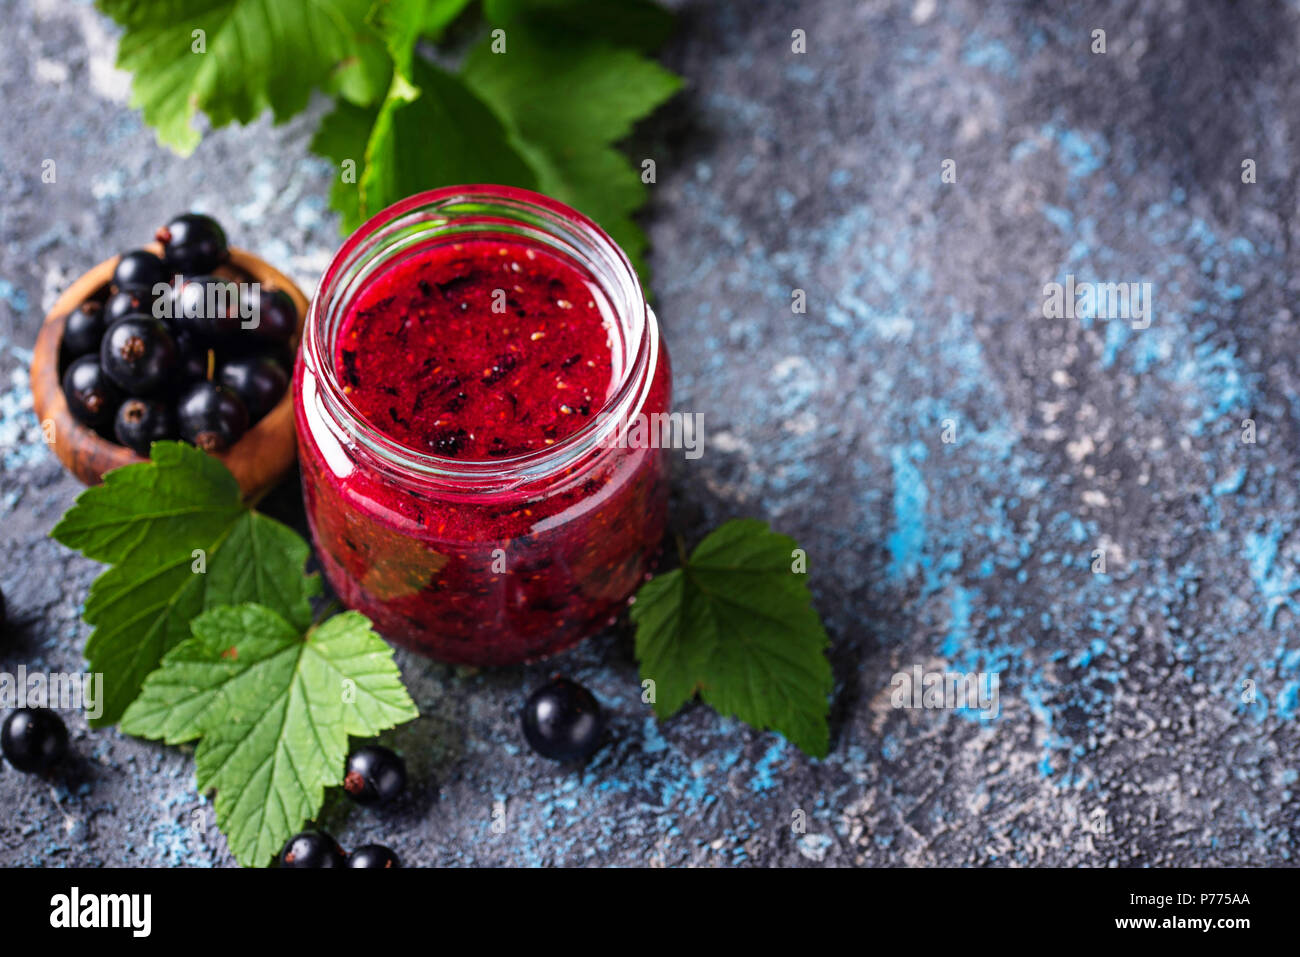 Black currant jam in jar - Stock Image